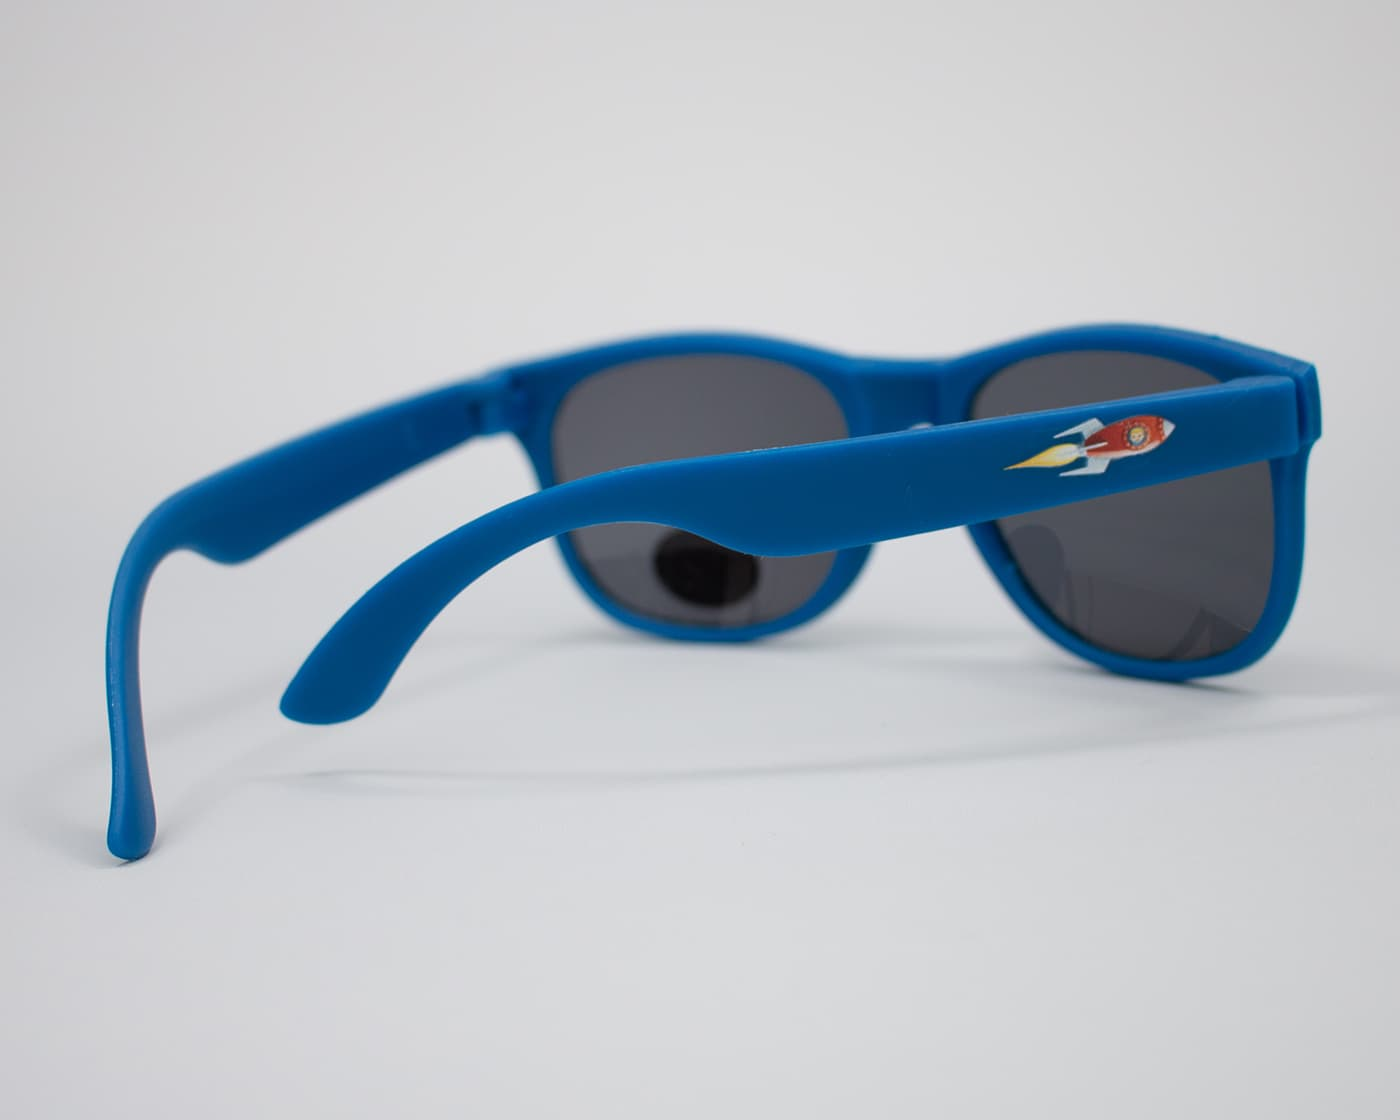 Blue-Printed-Sunglasses